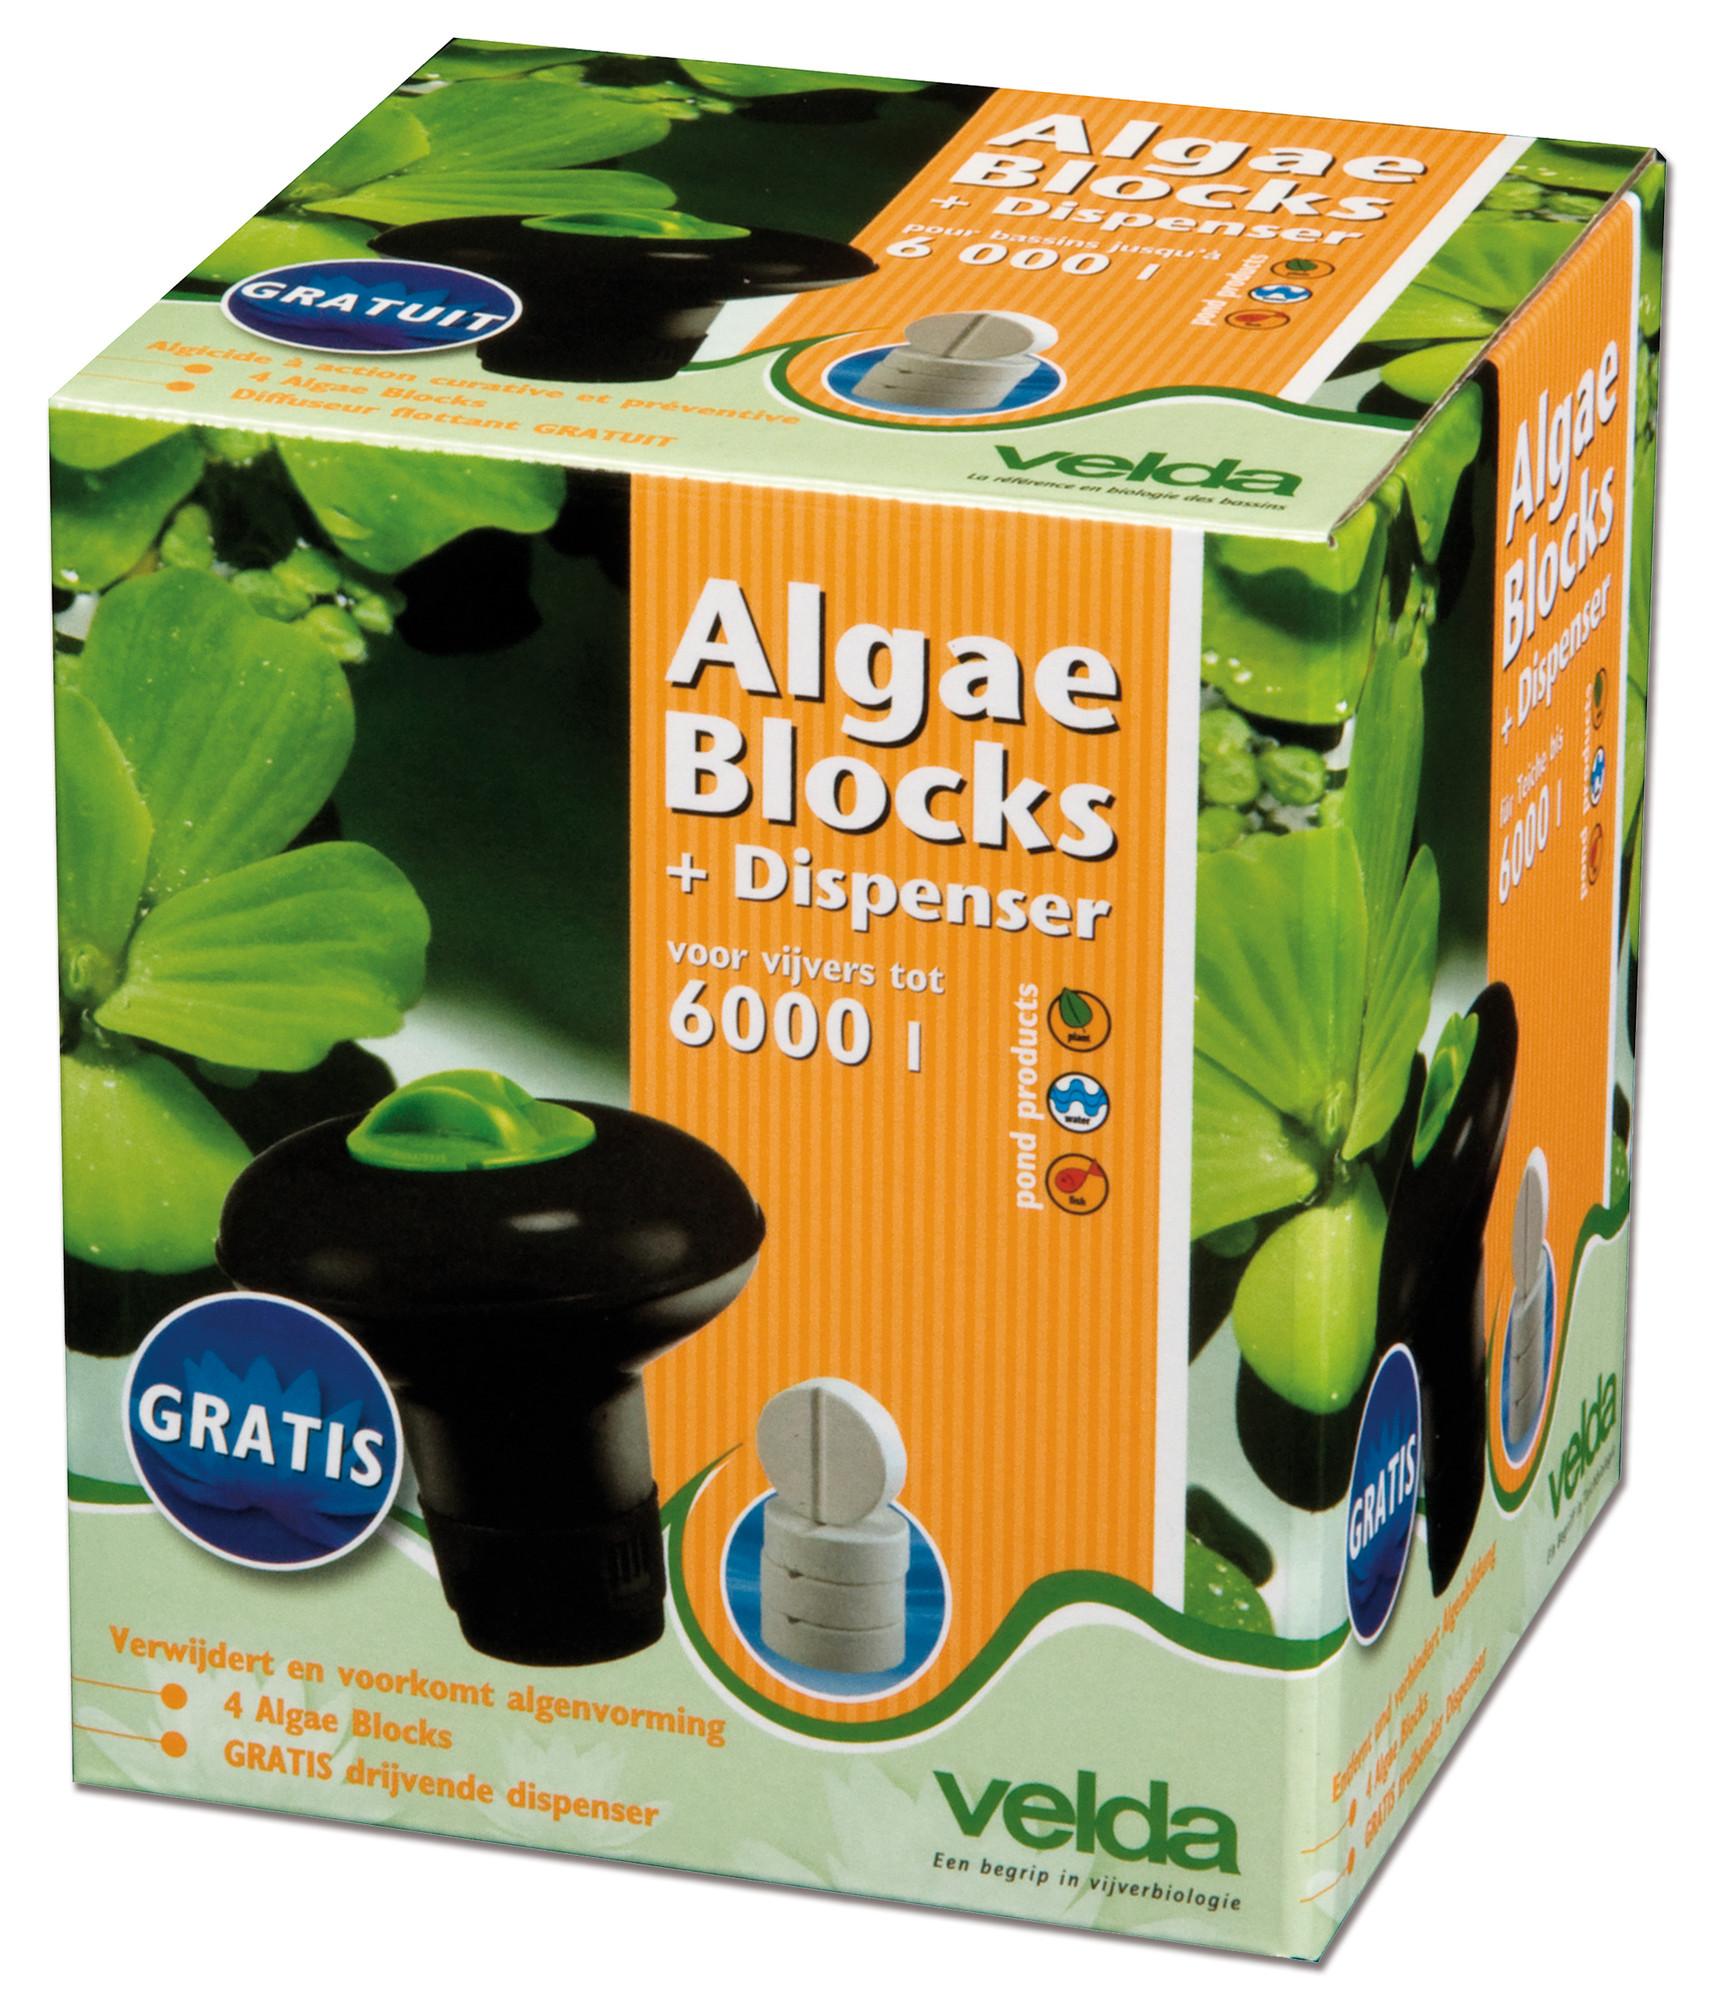 Velda Algae Blocks + Dispenser Voor 6000 Liter Water